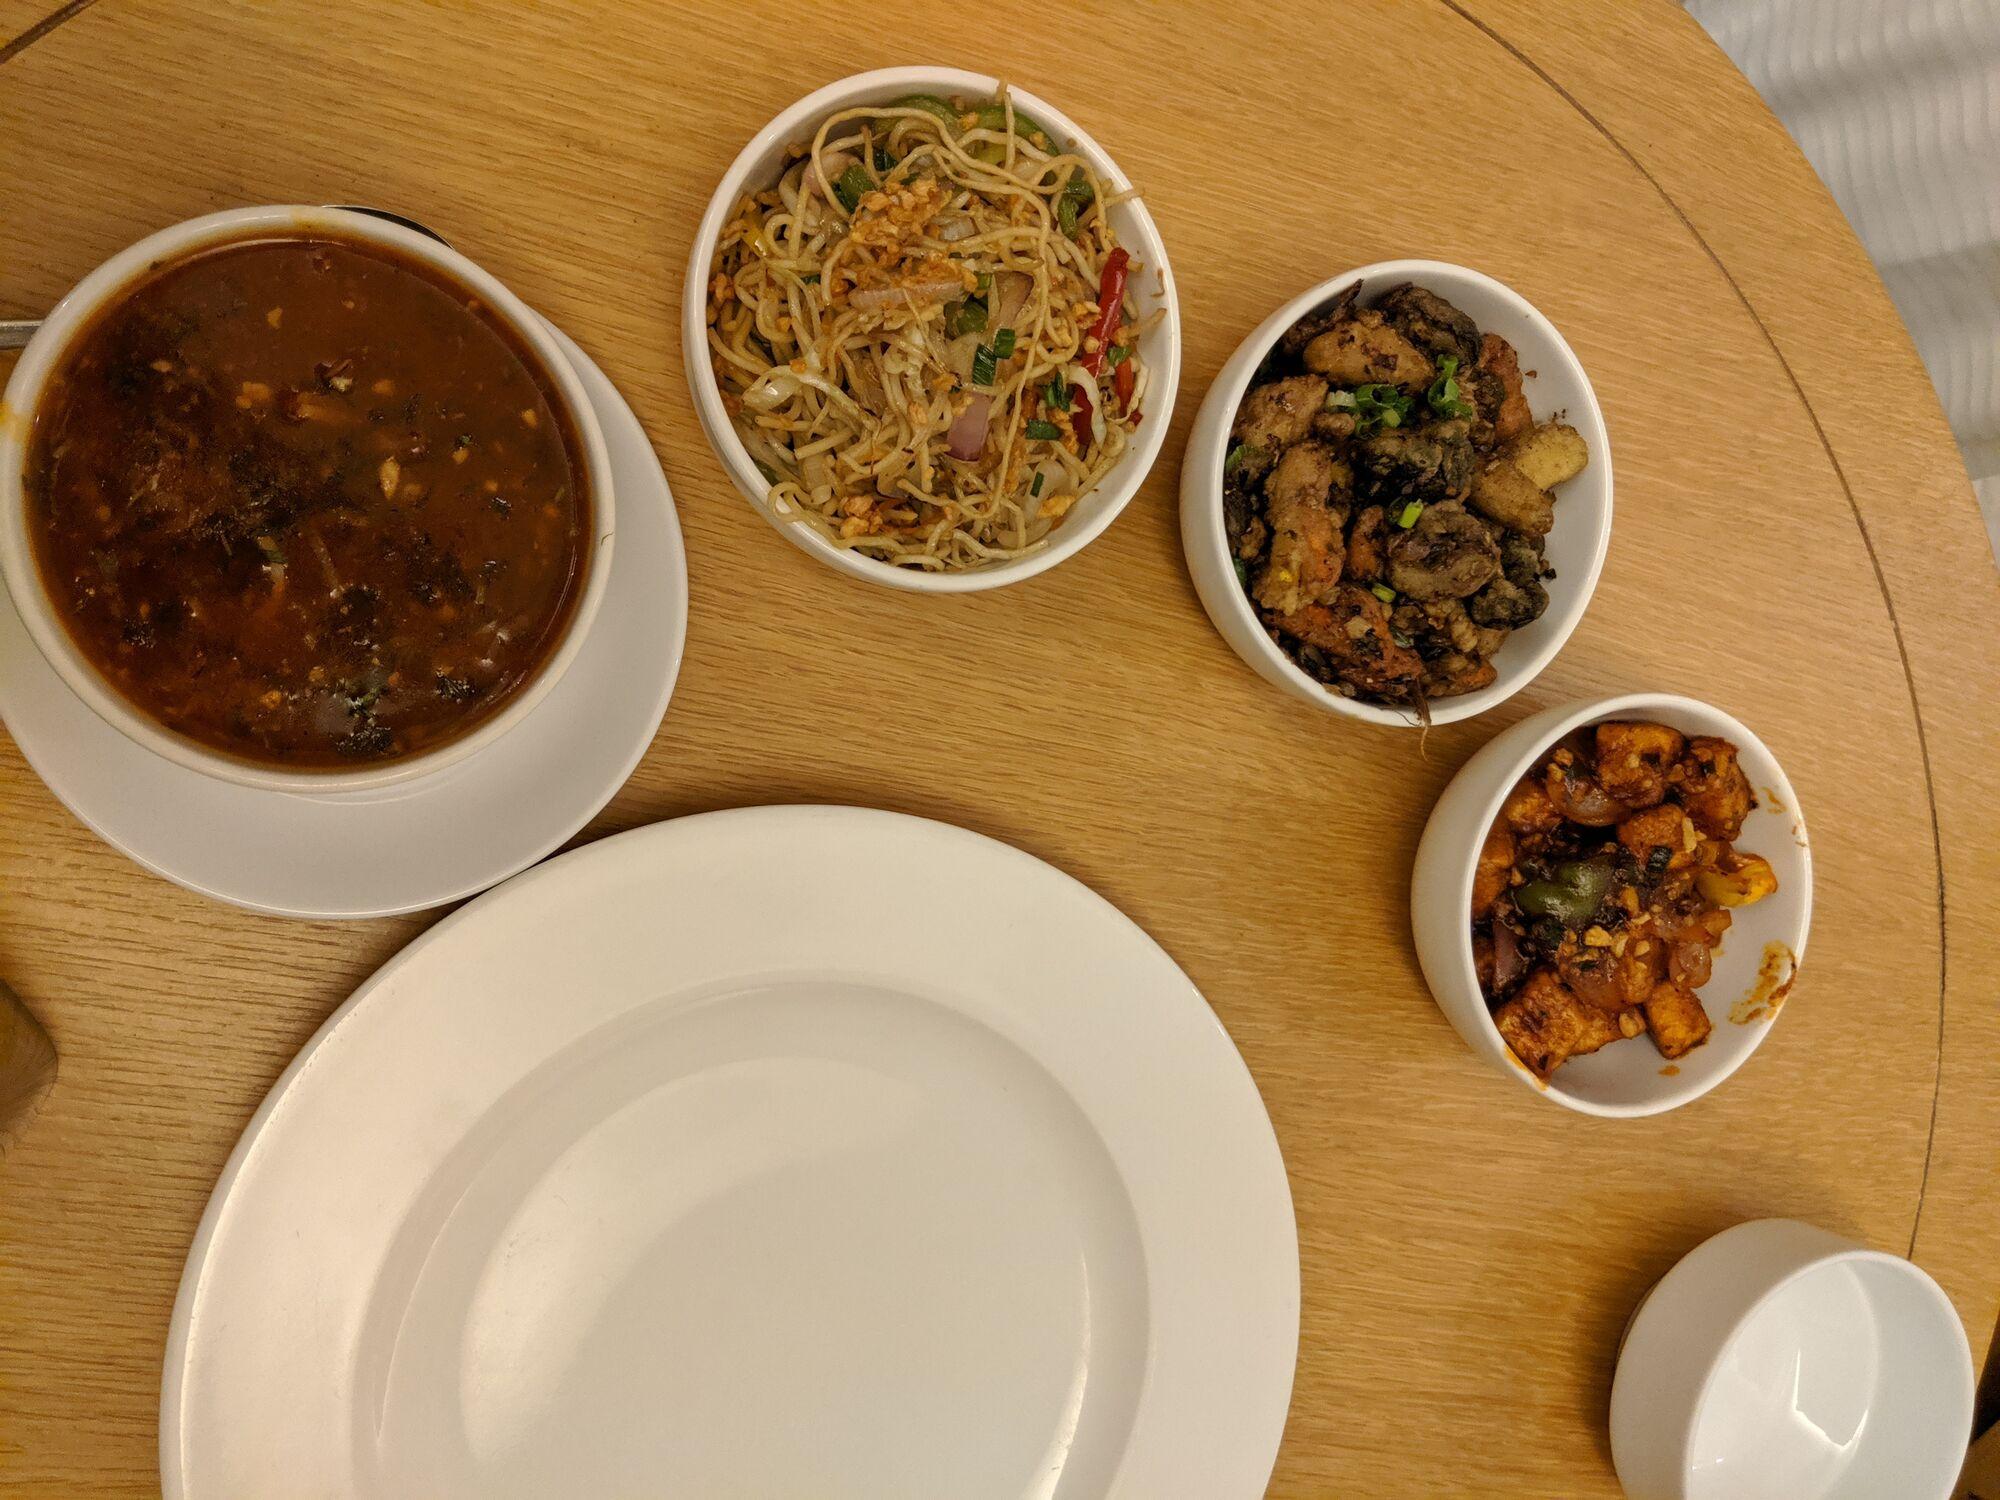 Tibetan Vegetarian Dinner